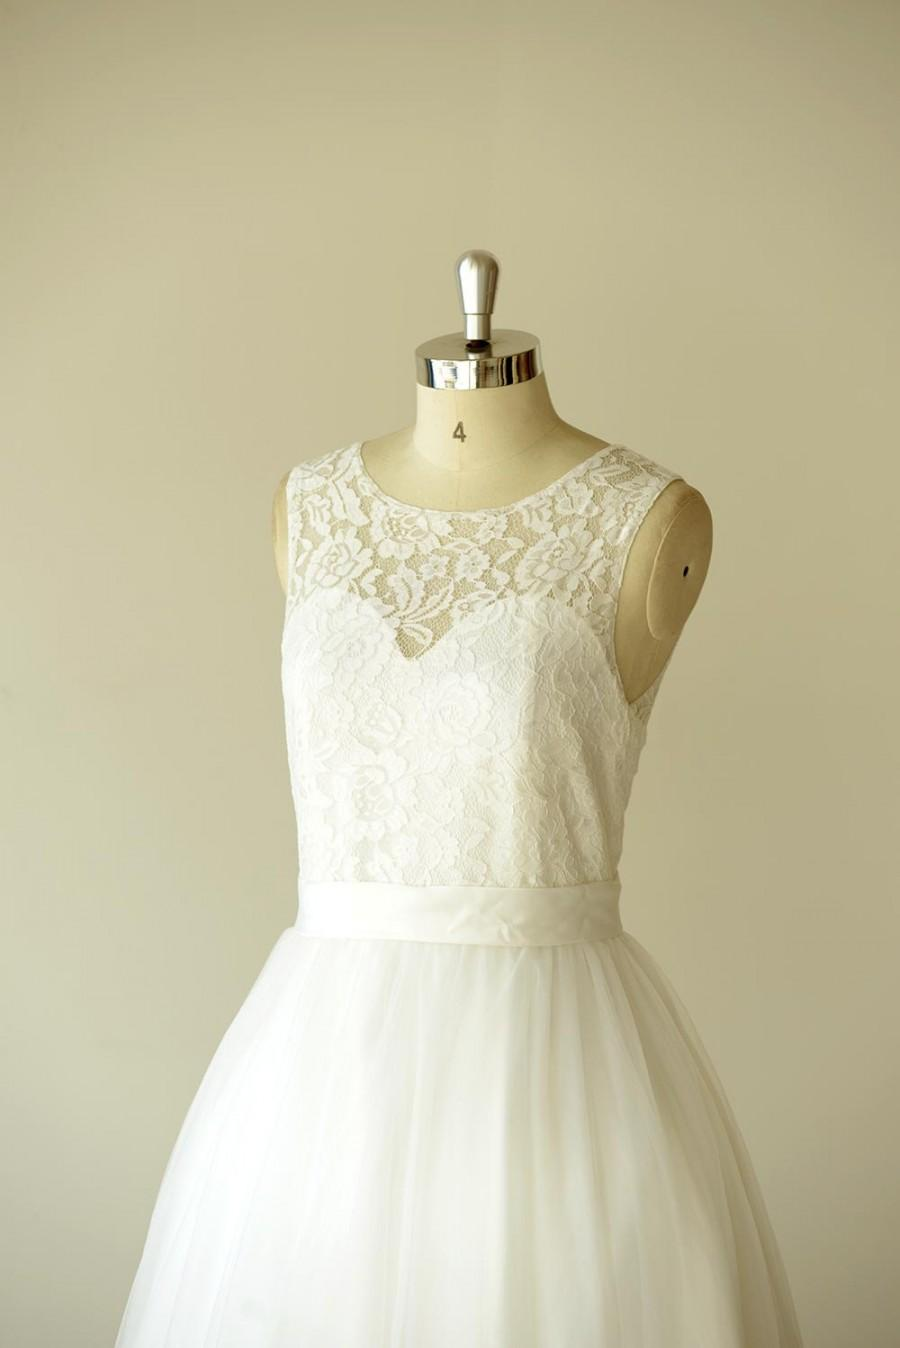 Boda - Lace Wedding Dress Sheer Neckline with Waistband Keyhole Back Floor Length